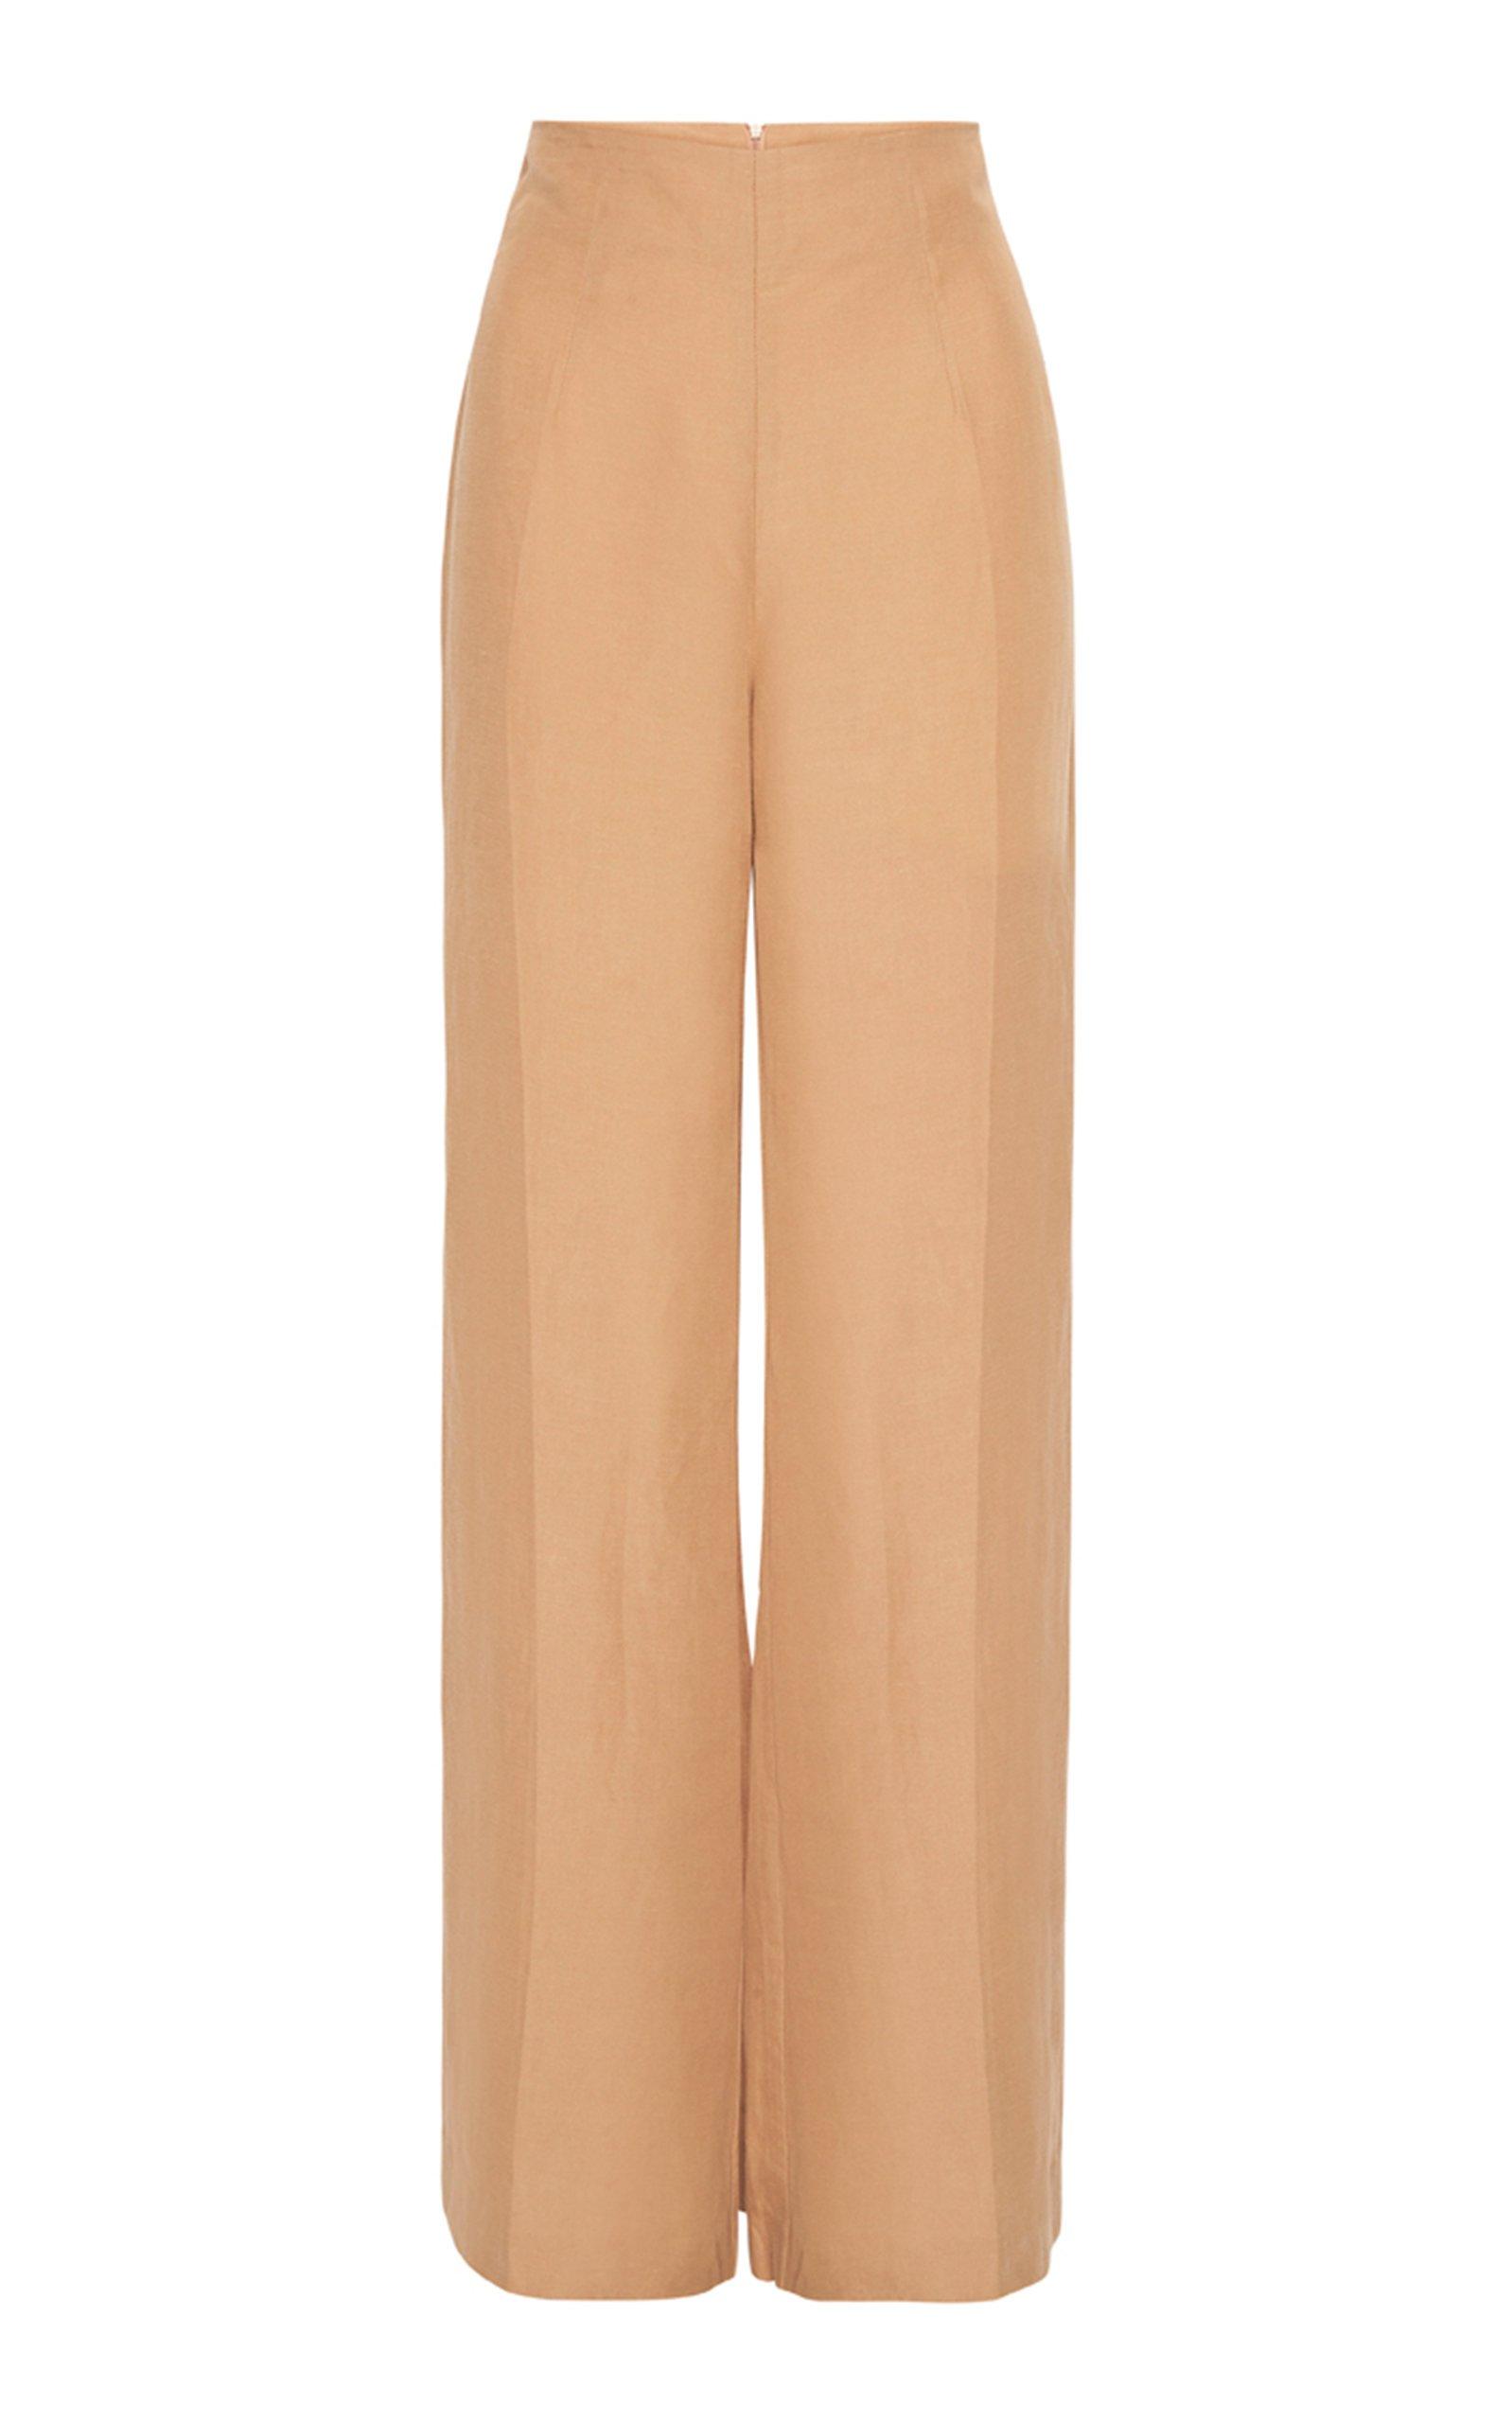 St. Agni Amo Trousers Size: XS